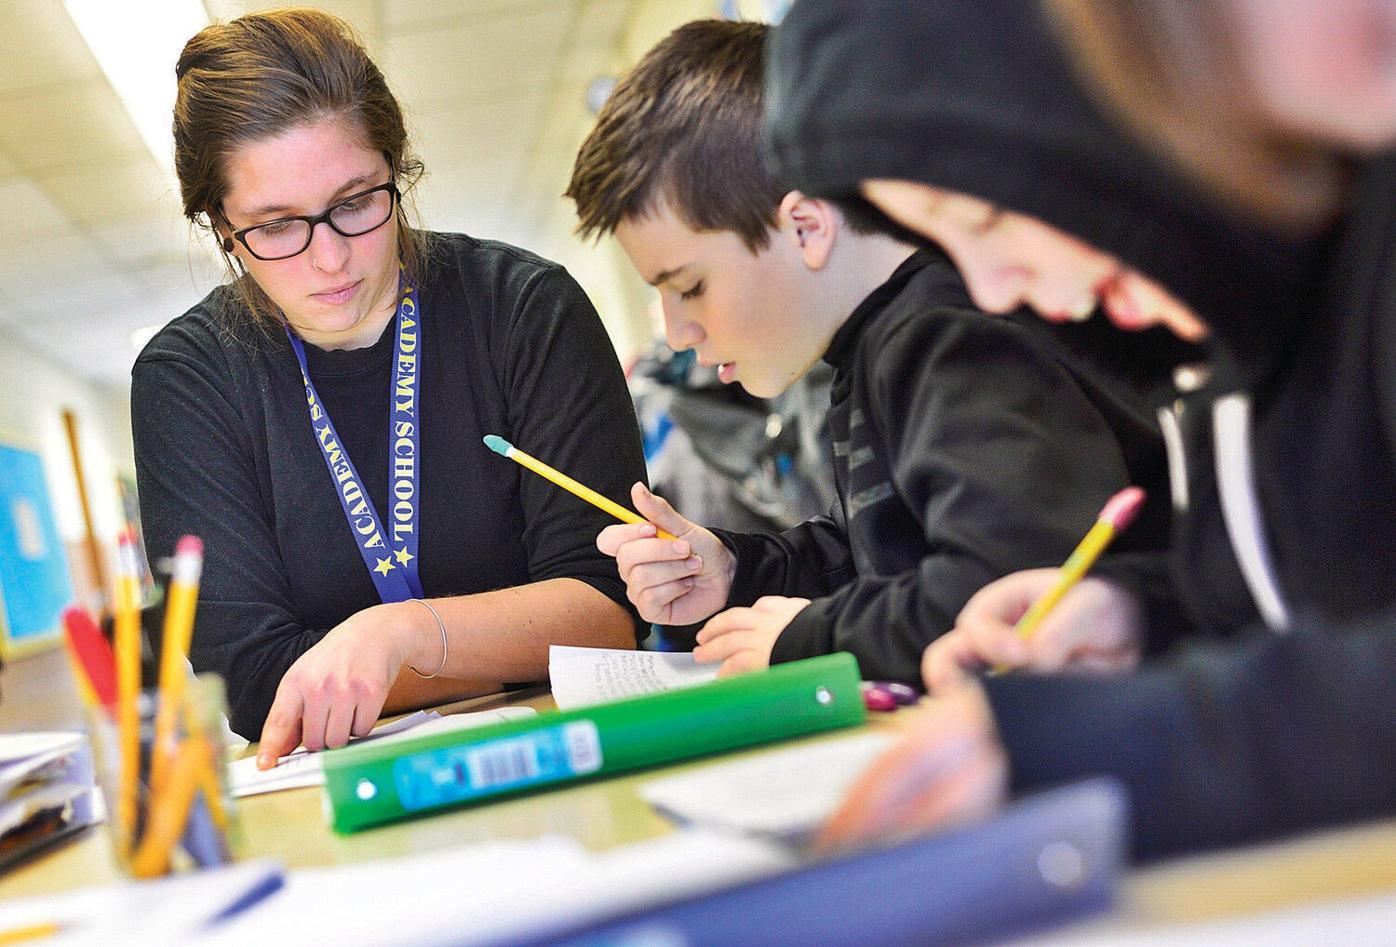 Interns get practical experience as teachers